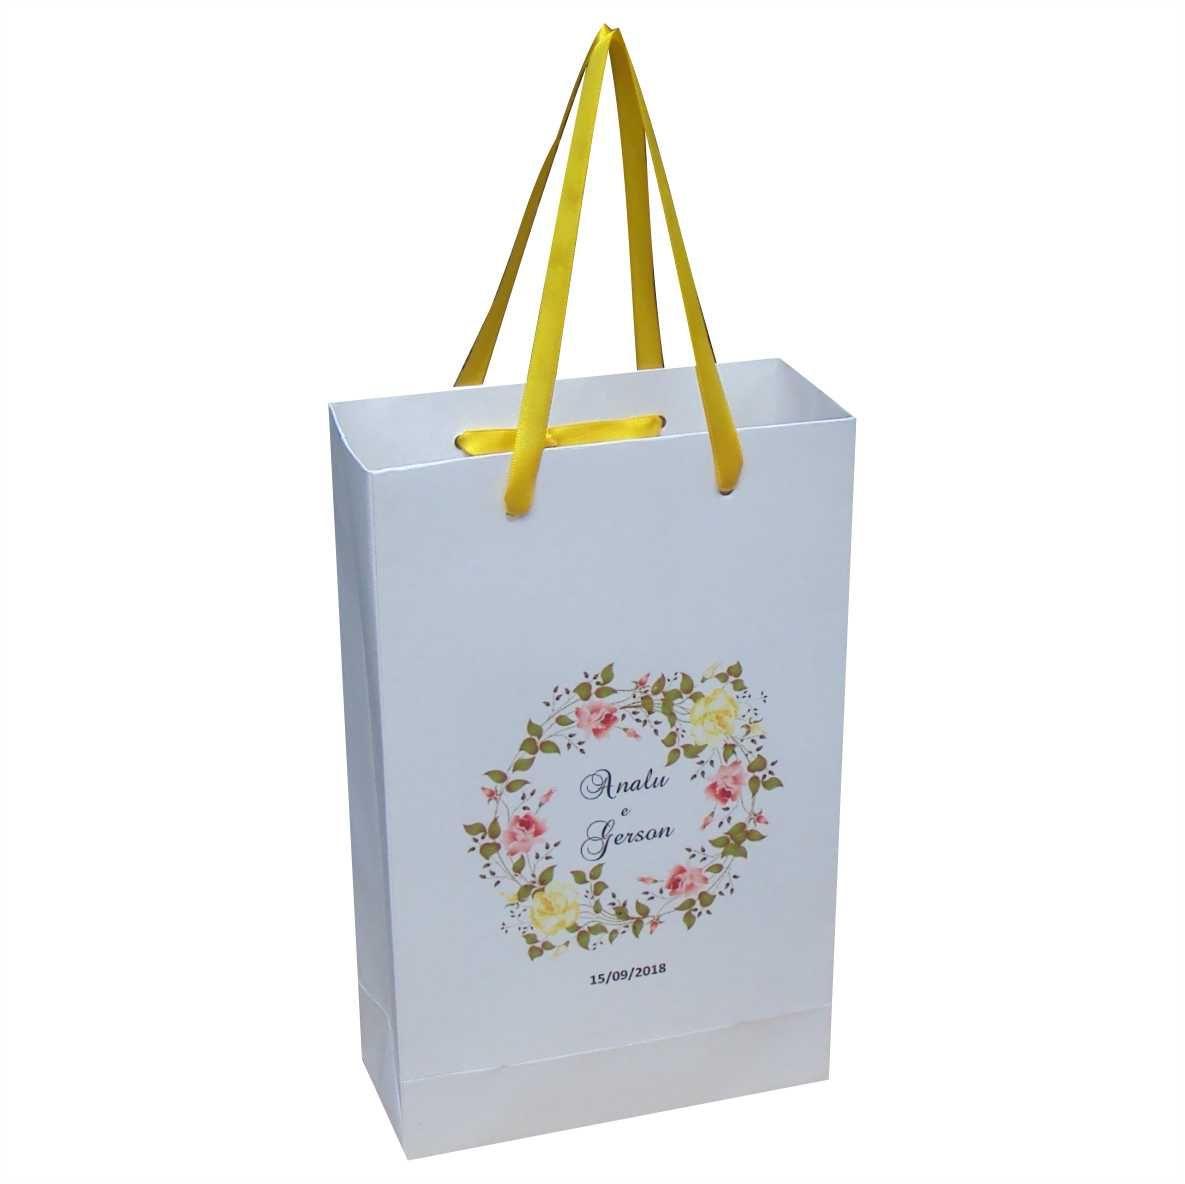 Sacola personalizada alça de cetim ideal para casamento - 10 unidades